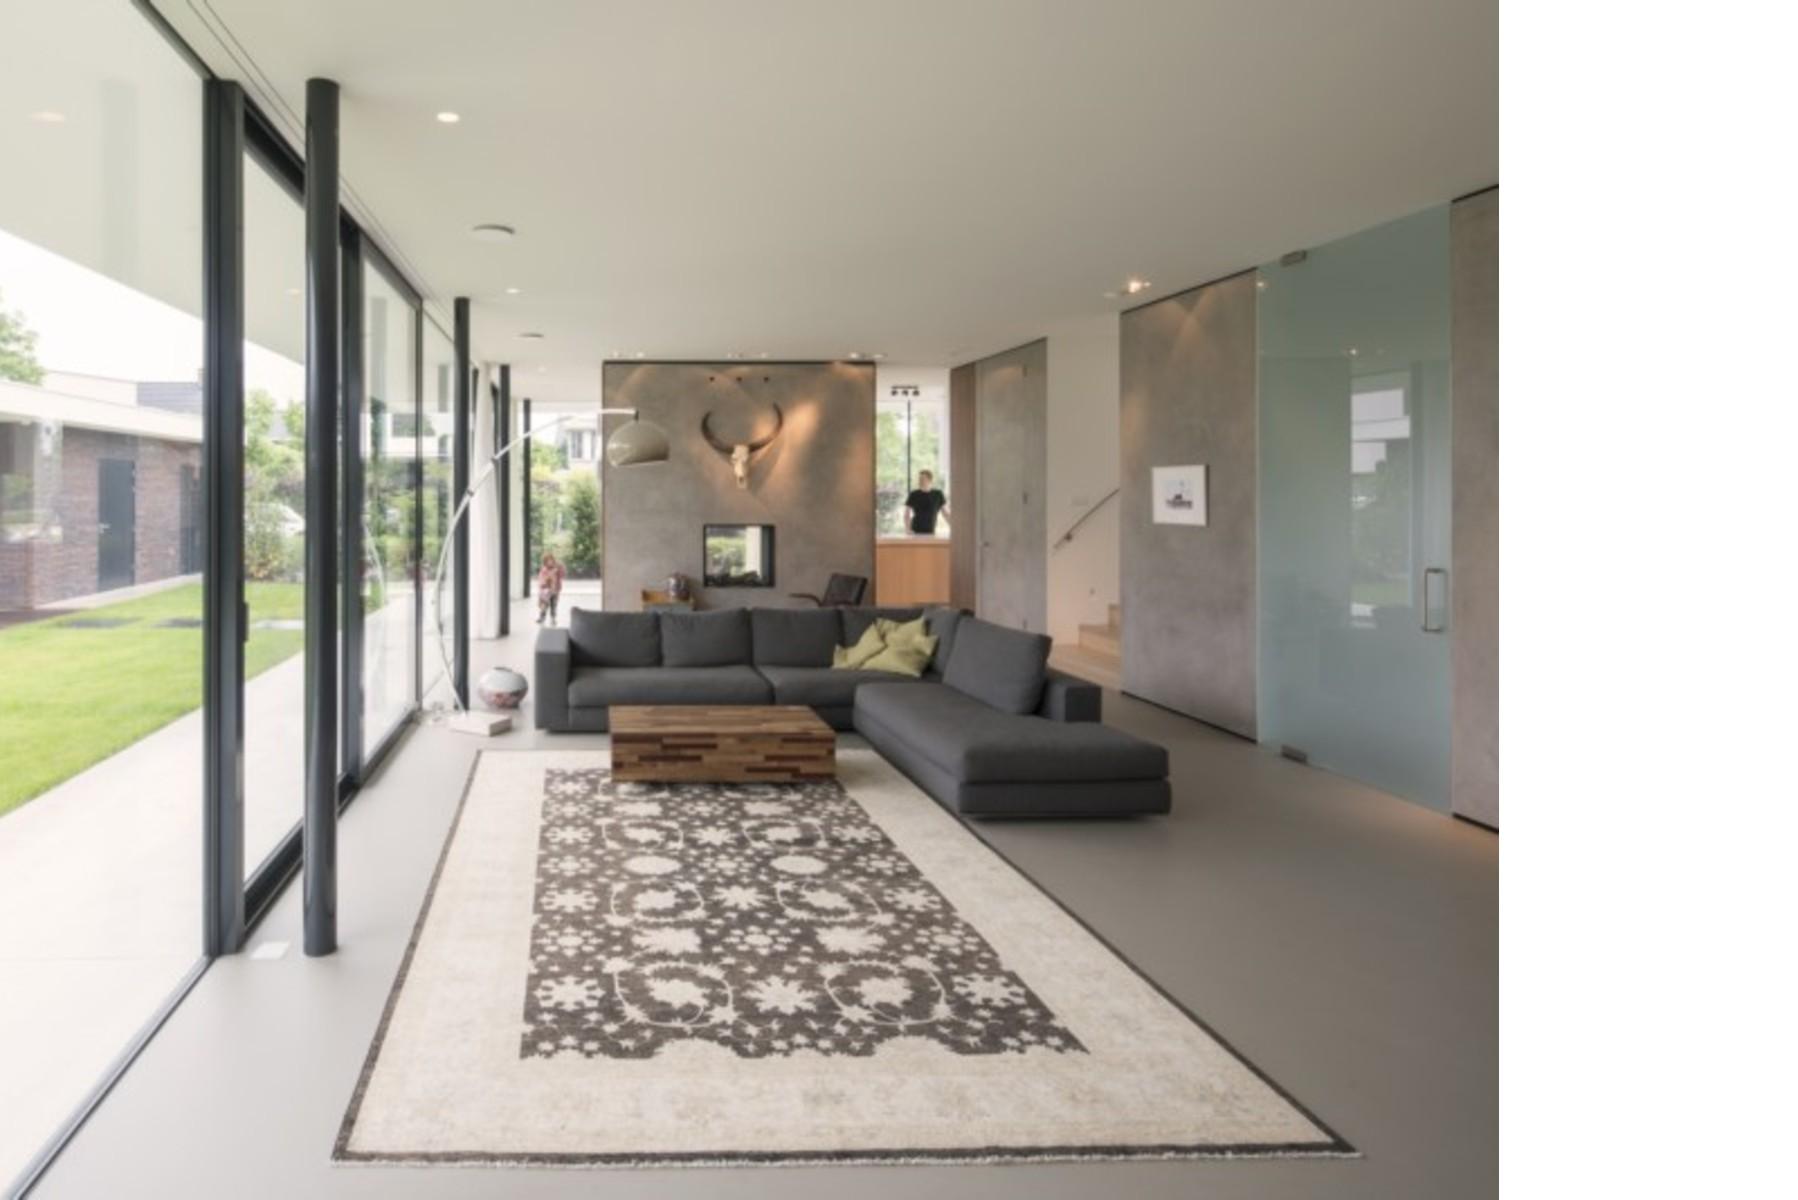 Powerhouse Company Villa CG Das Schoenste Haus | Floornature